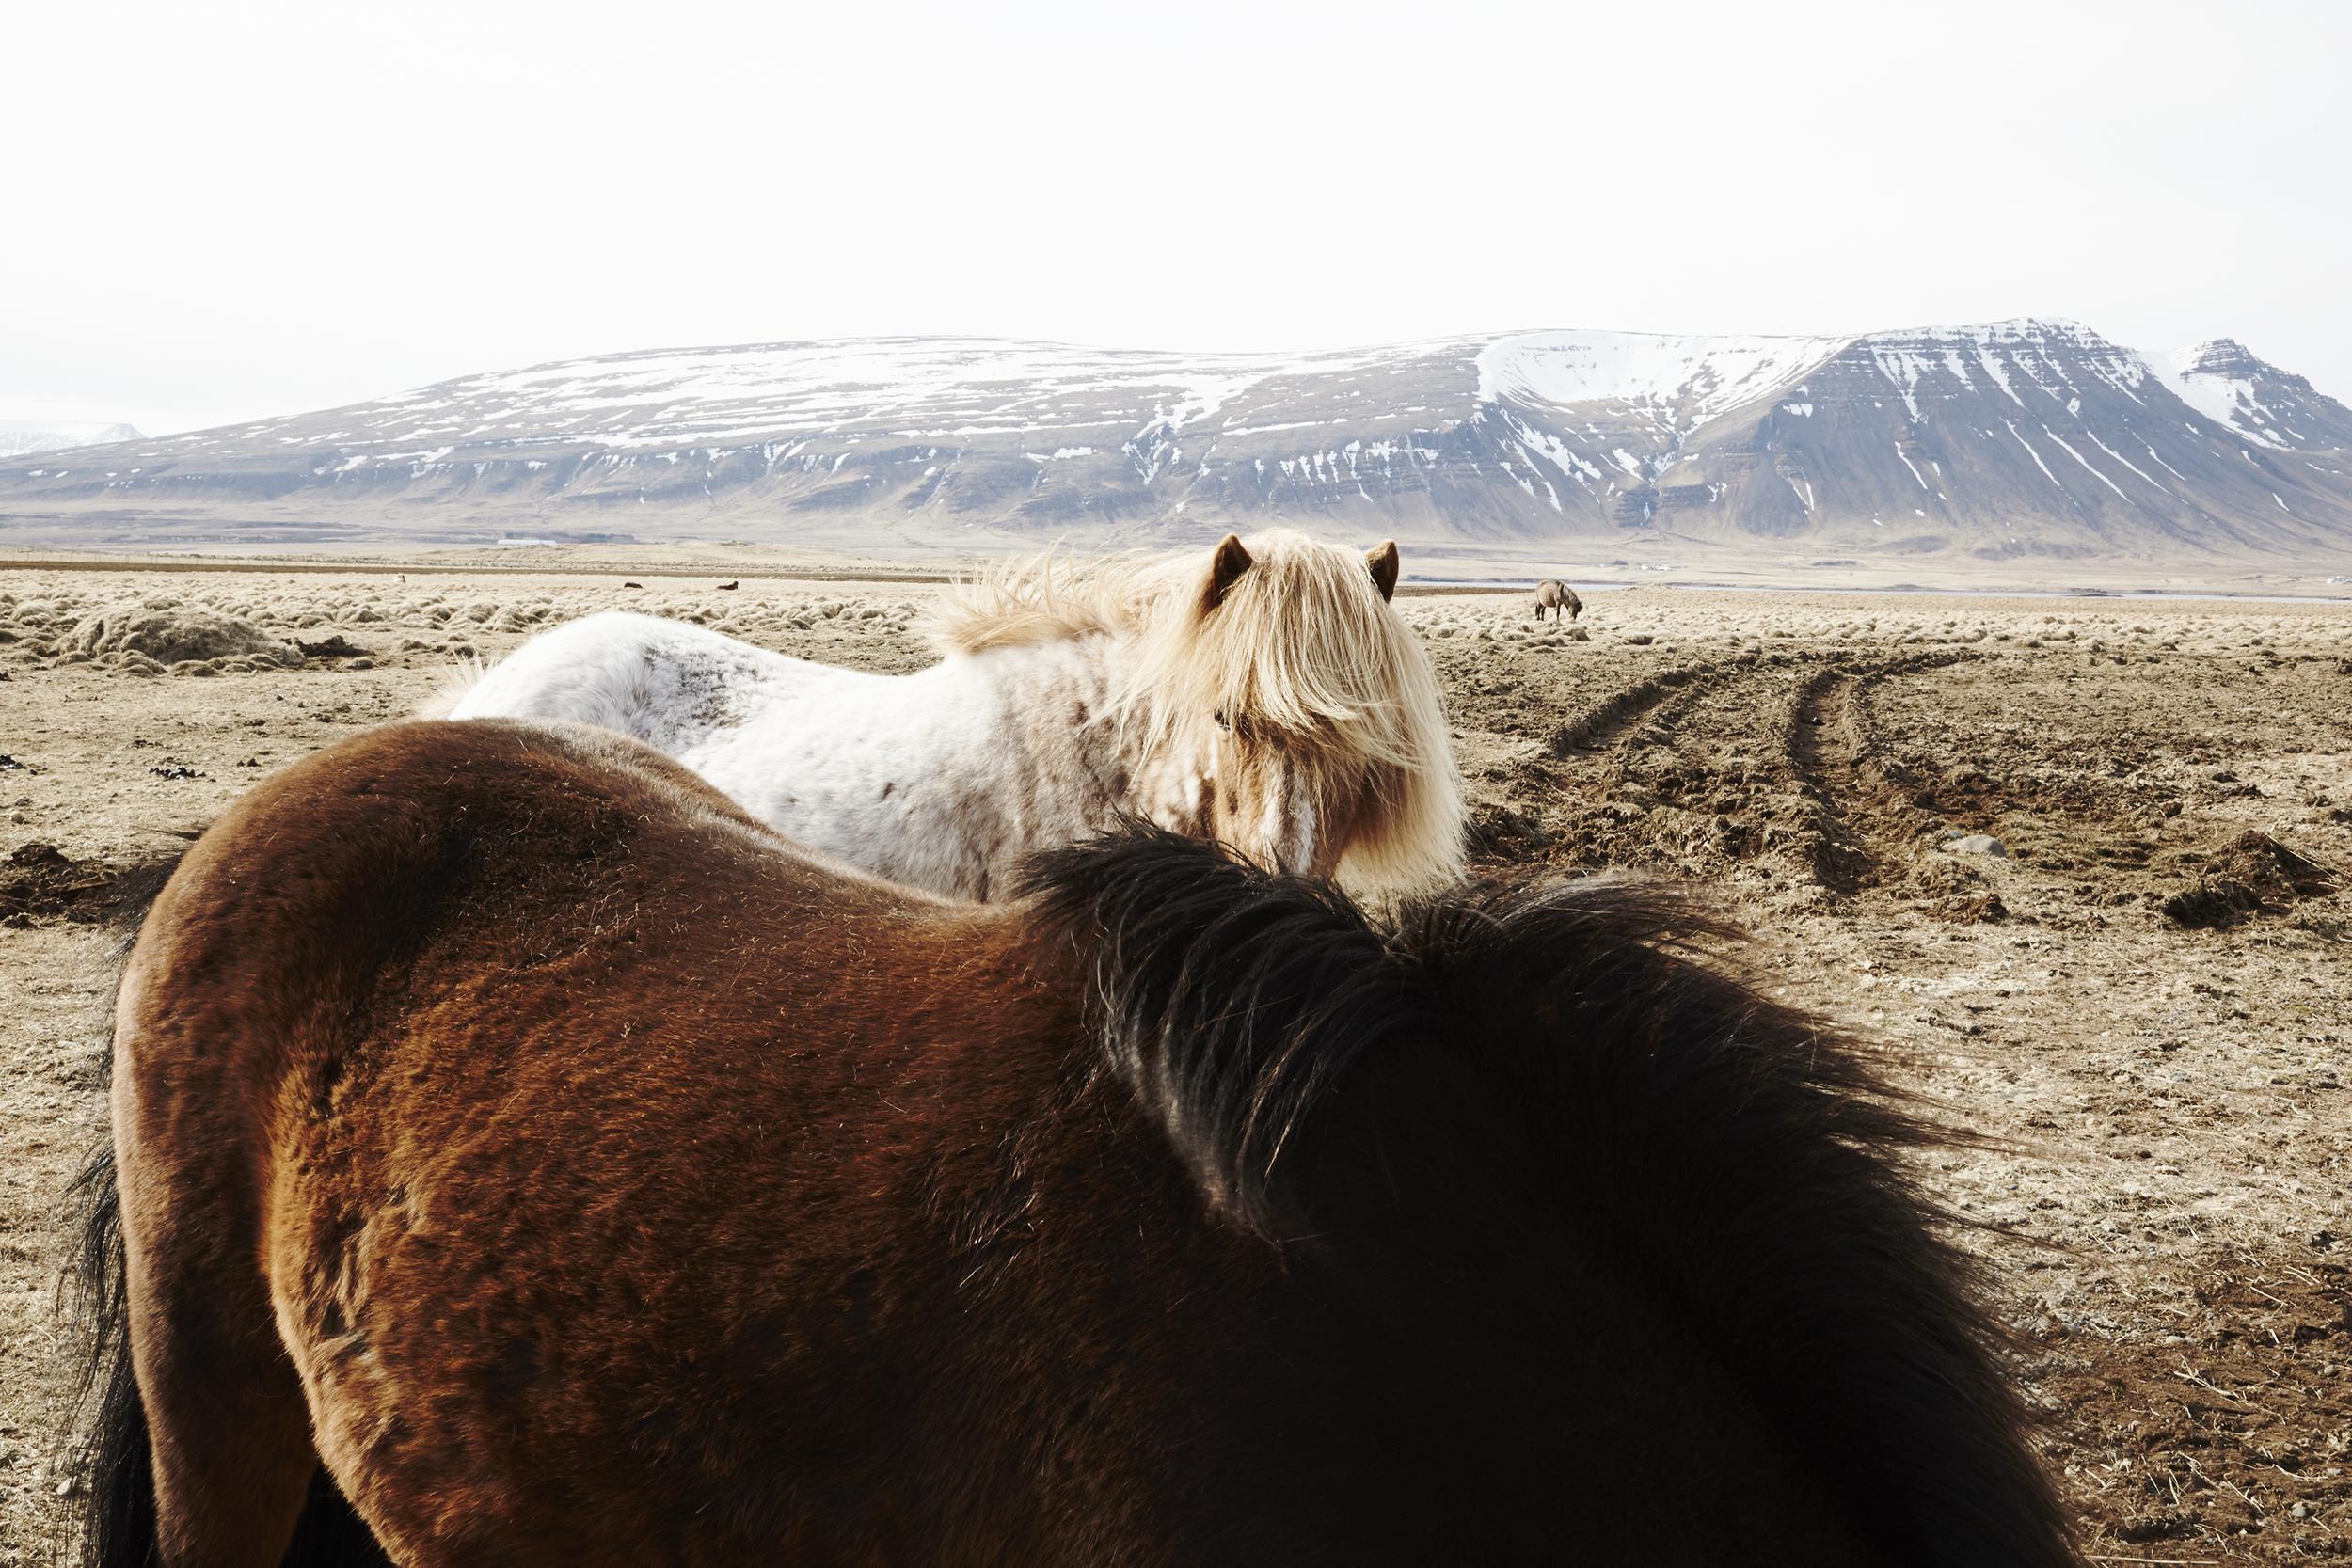 15_05_09_Iceland_West0009F.jpg